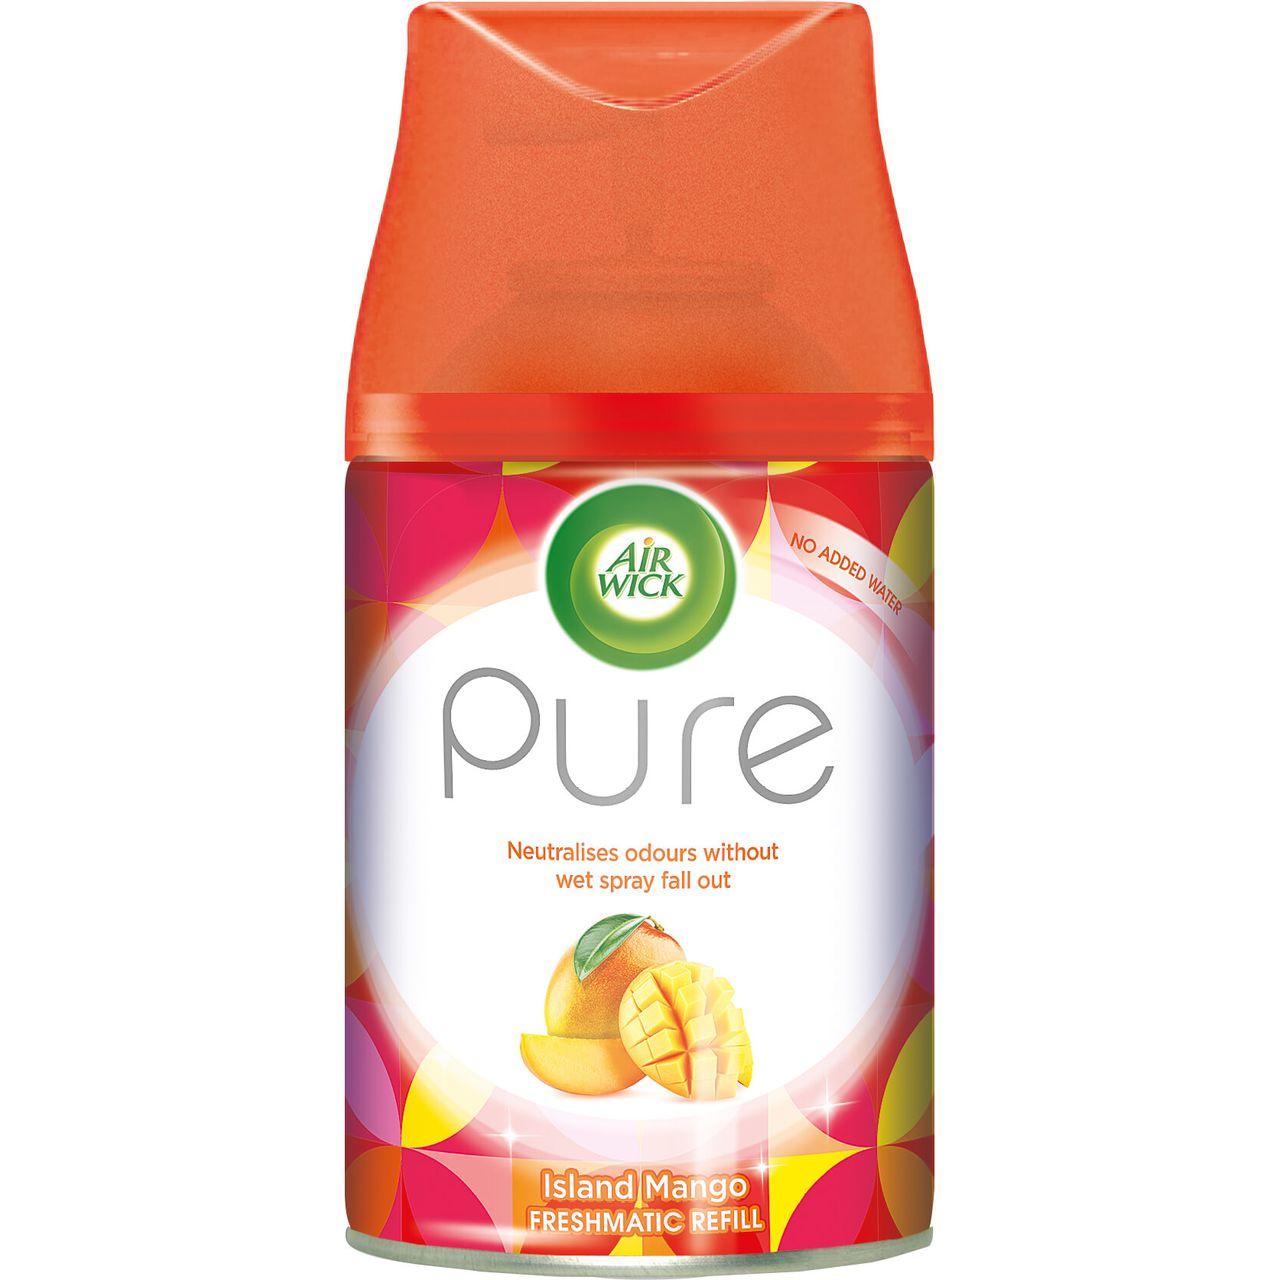 Air Wick® Air Freshener Pure Freshmatic Refill Island Mango